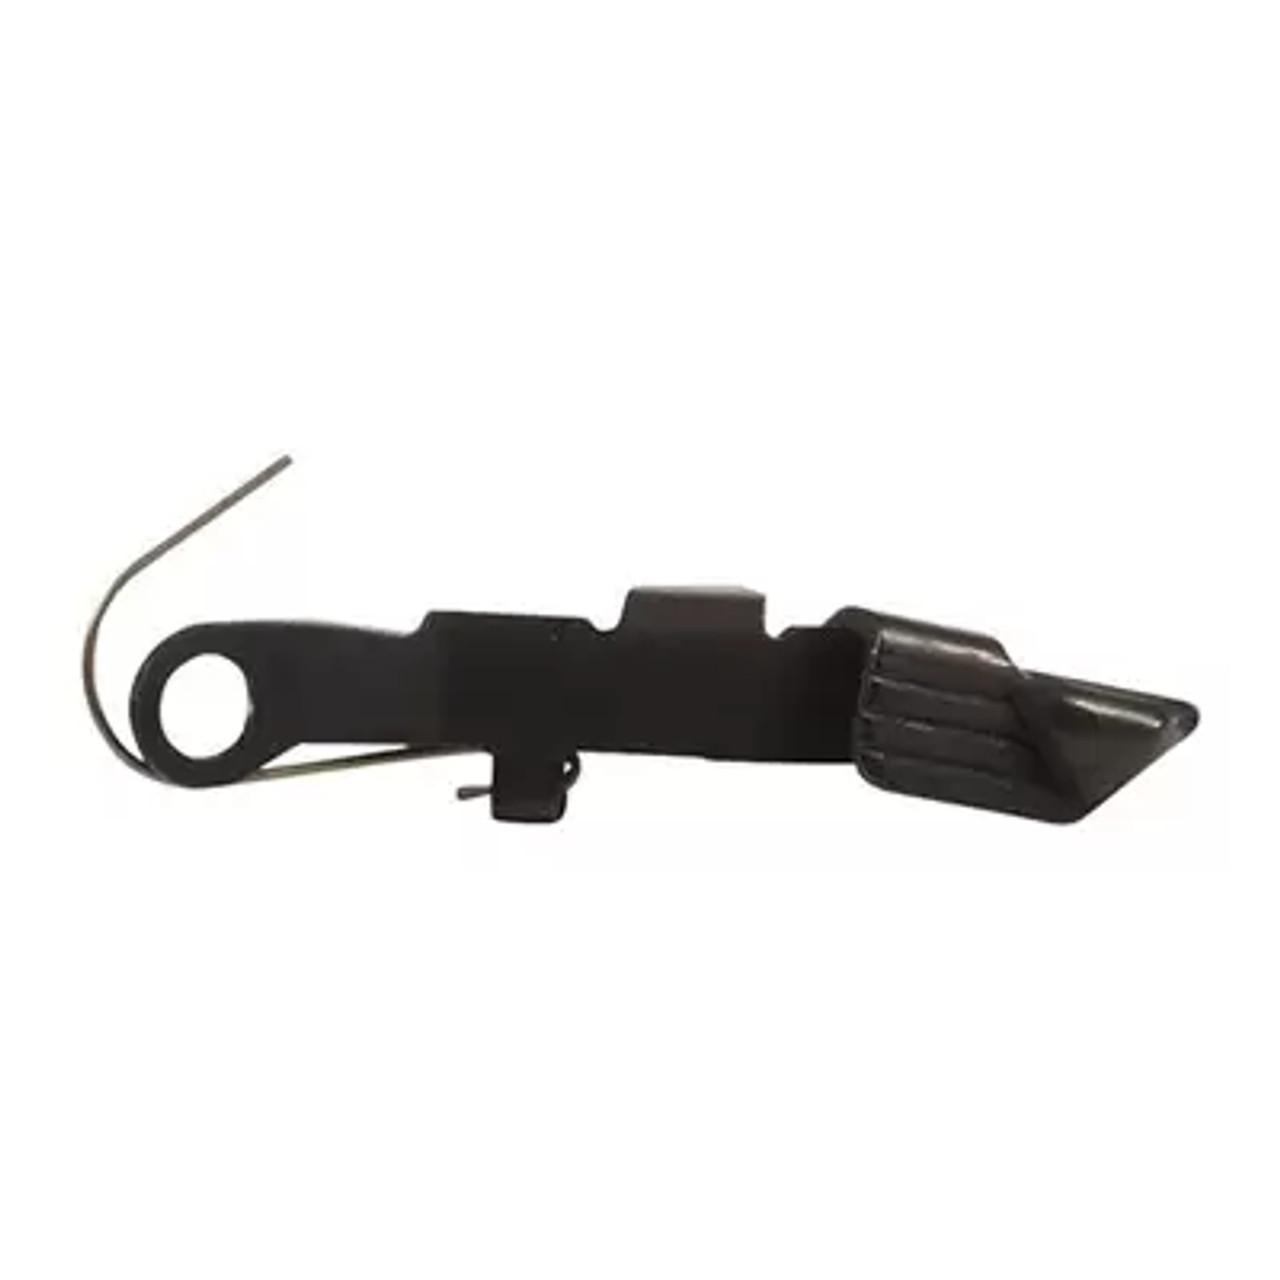 Glock Extended Slide Stop Lever (3 pin)